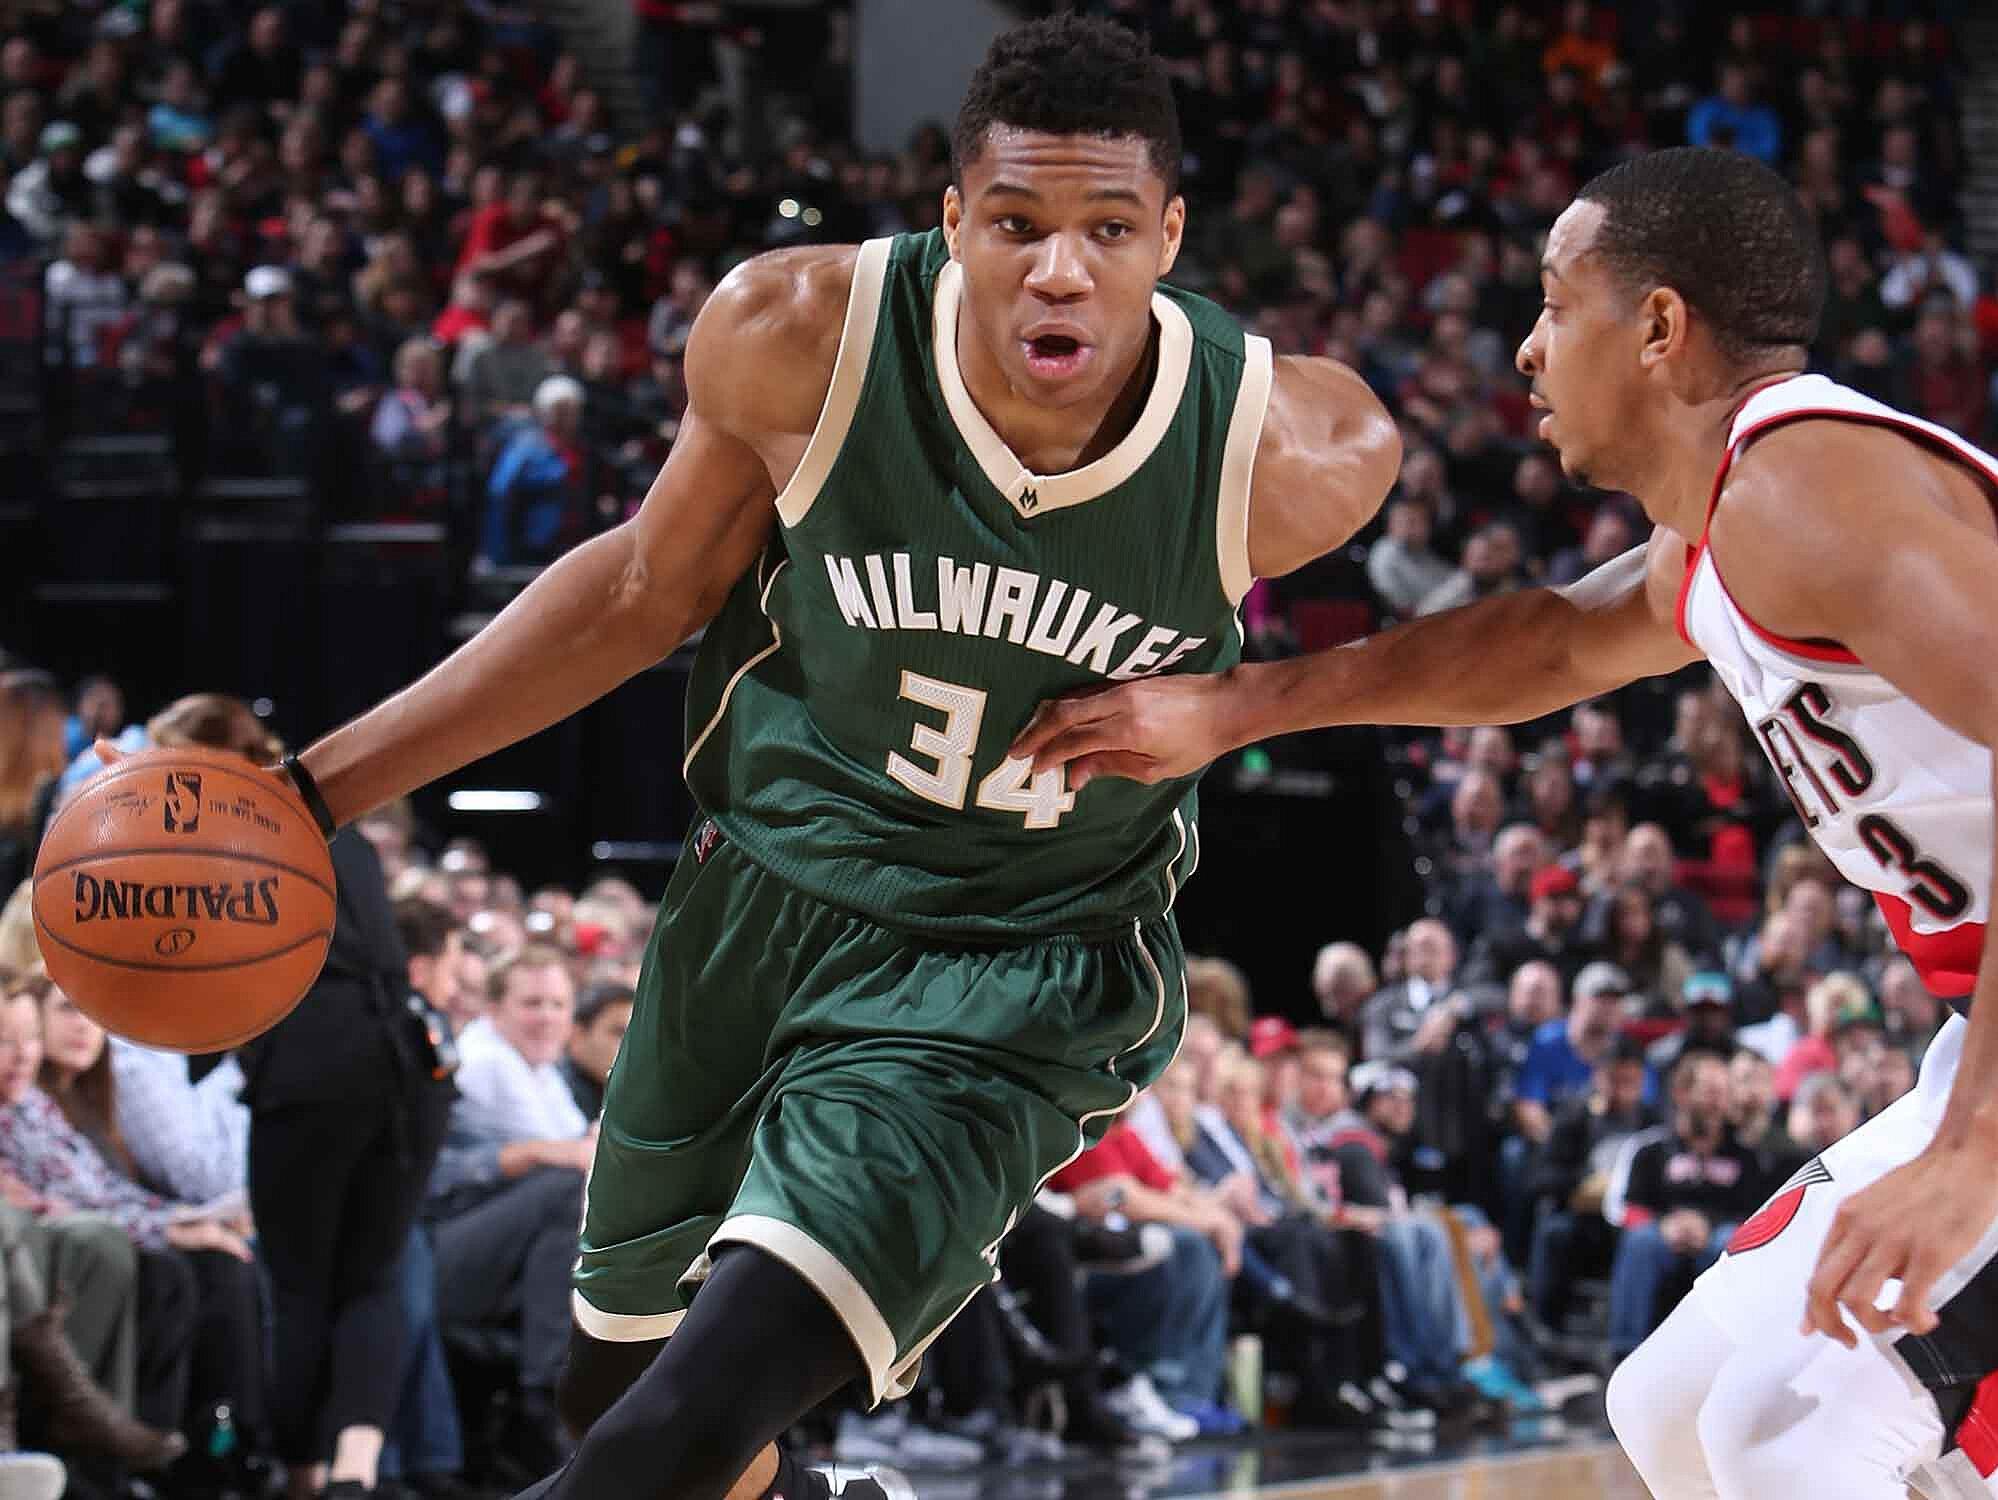 f8b75a67e9c Giannis Antetokounmpo: Bucks Unleash The Greek Freak | SI.com